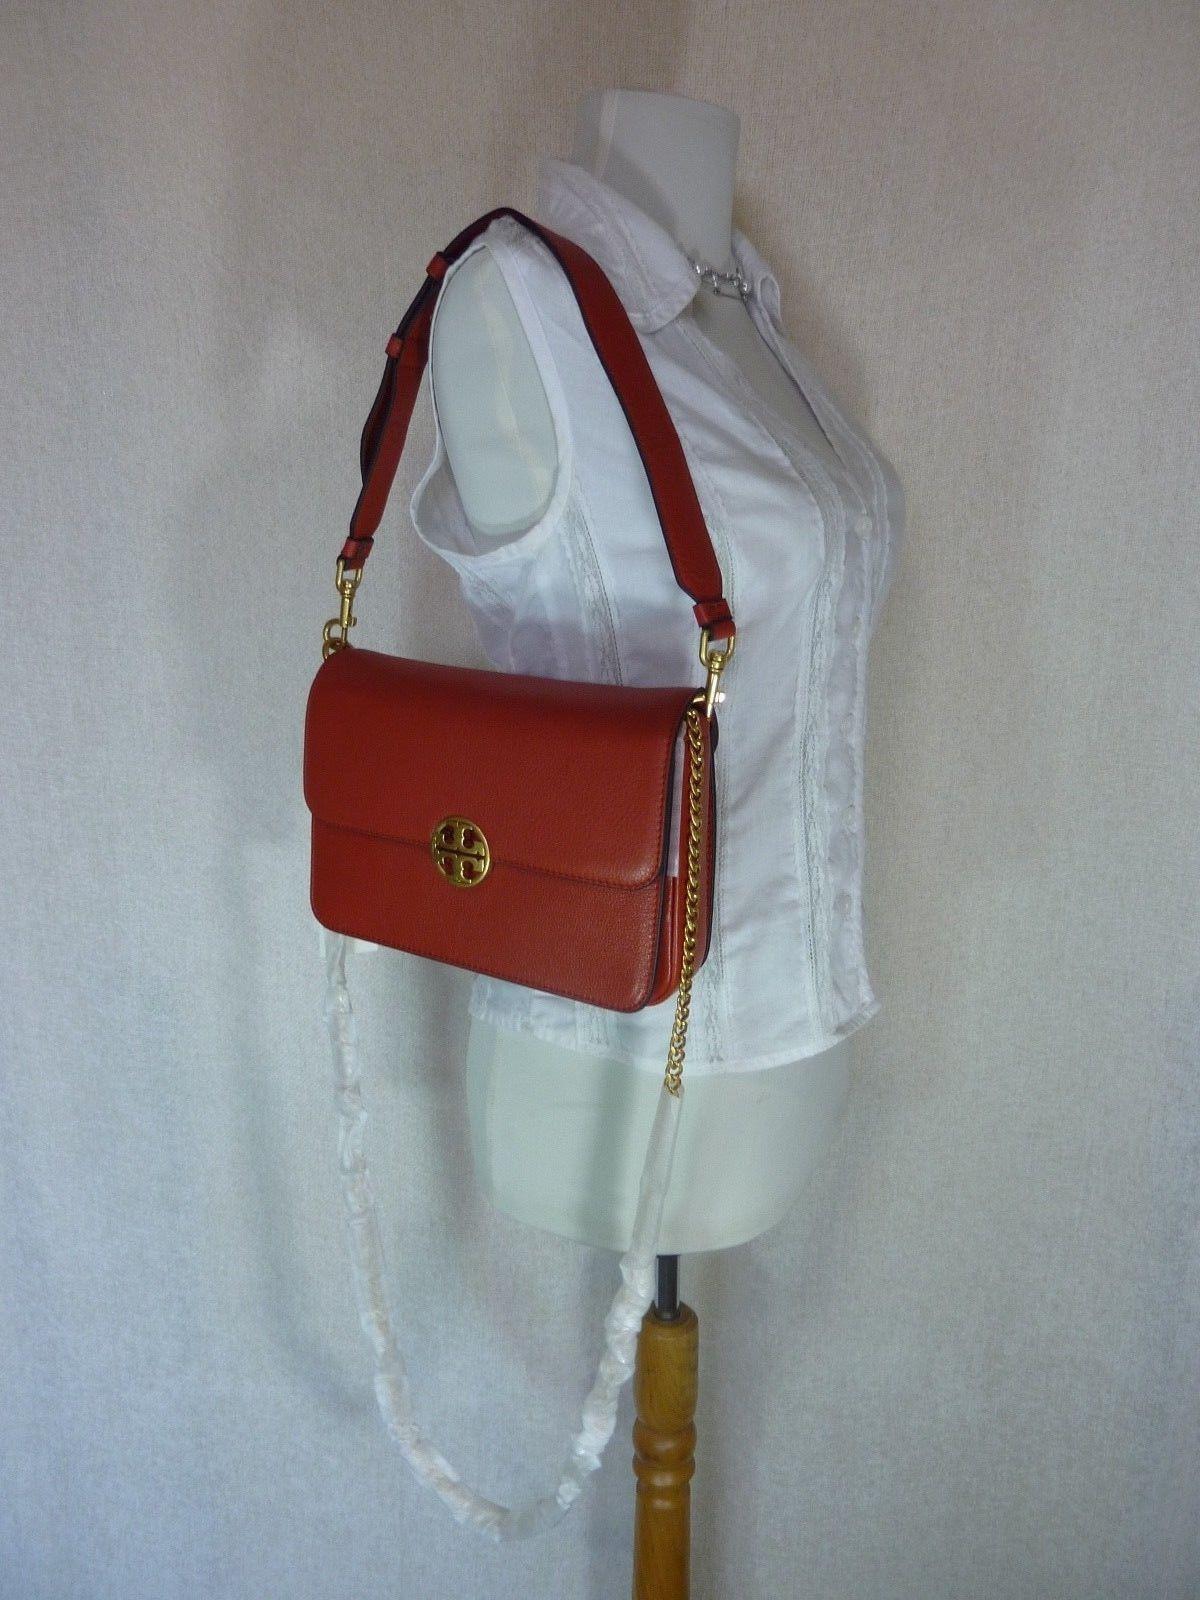 NWT Tory Burch Kola Chelsea Convertible Shoulder Bag  - $498 image 2